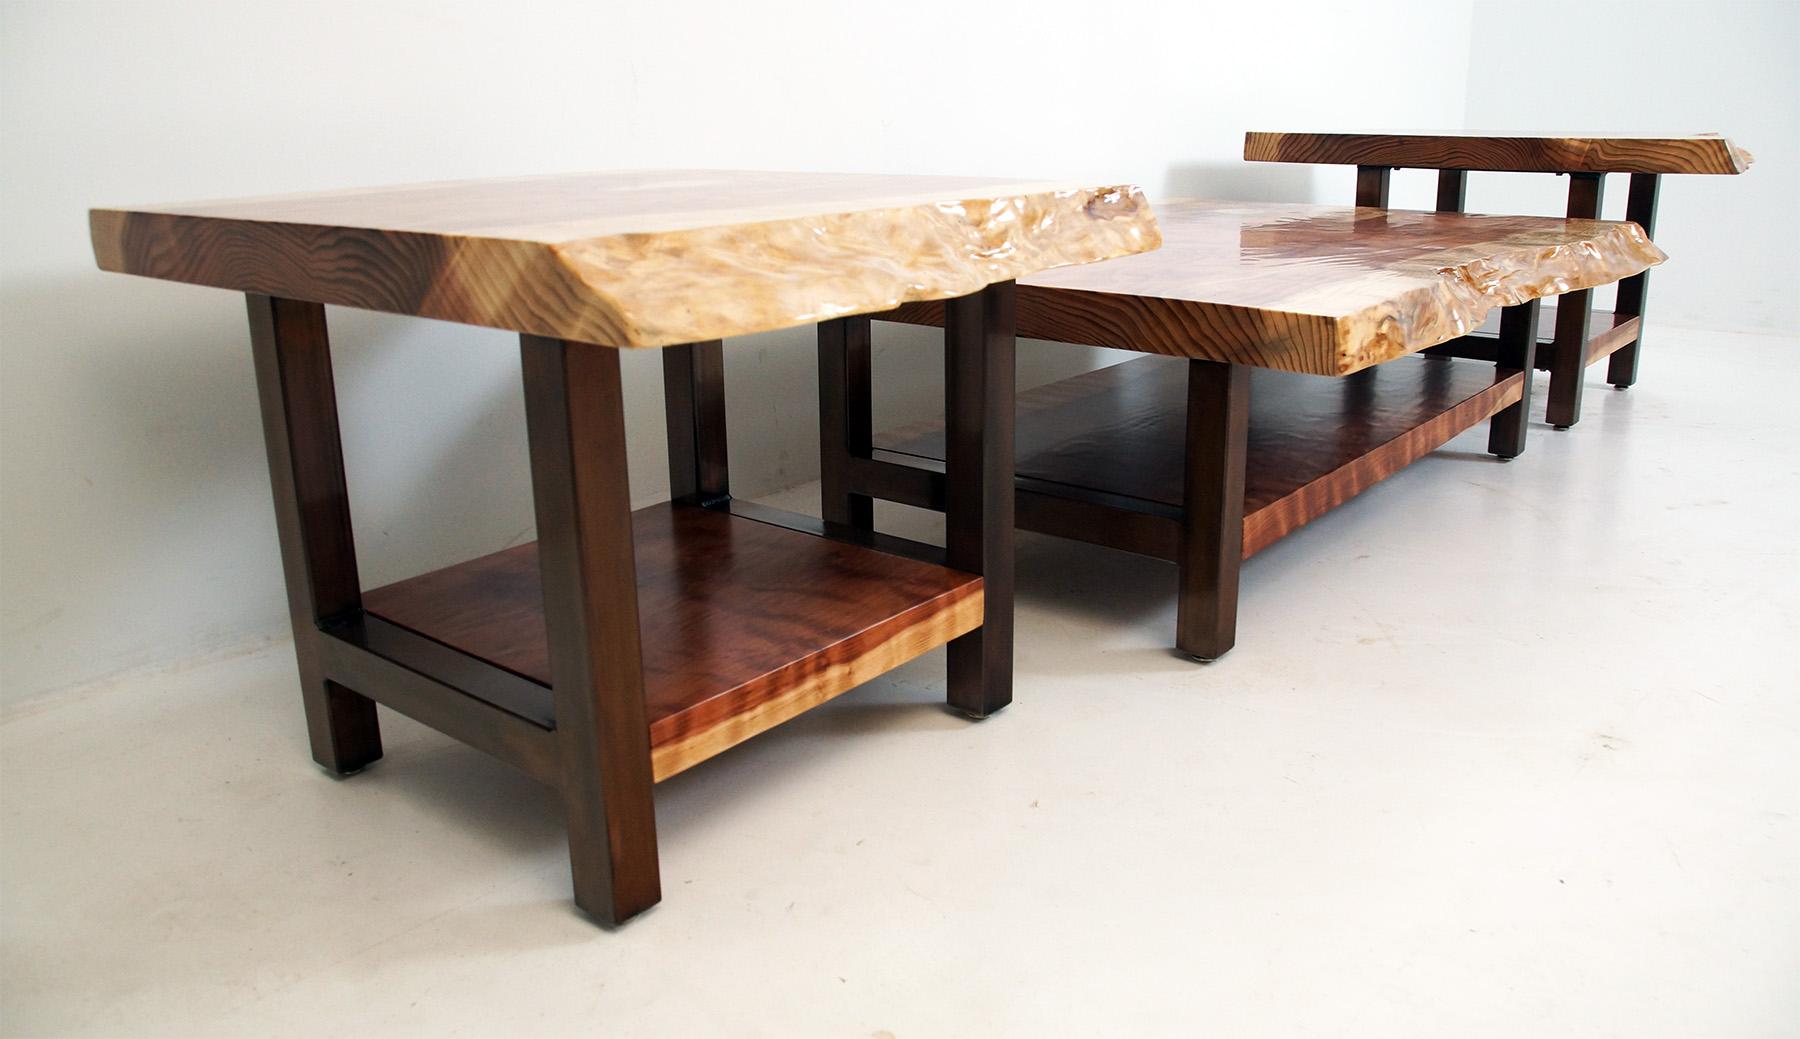 Live Edge Redwood Coffee Table & Side Table Set